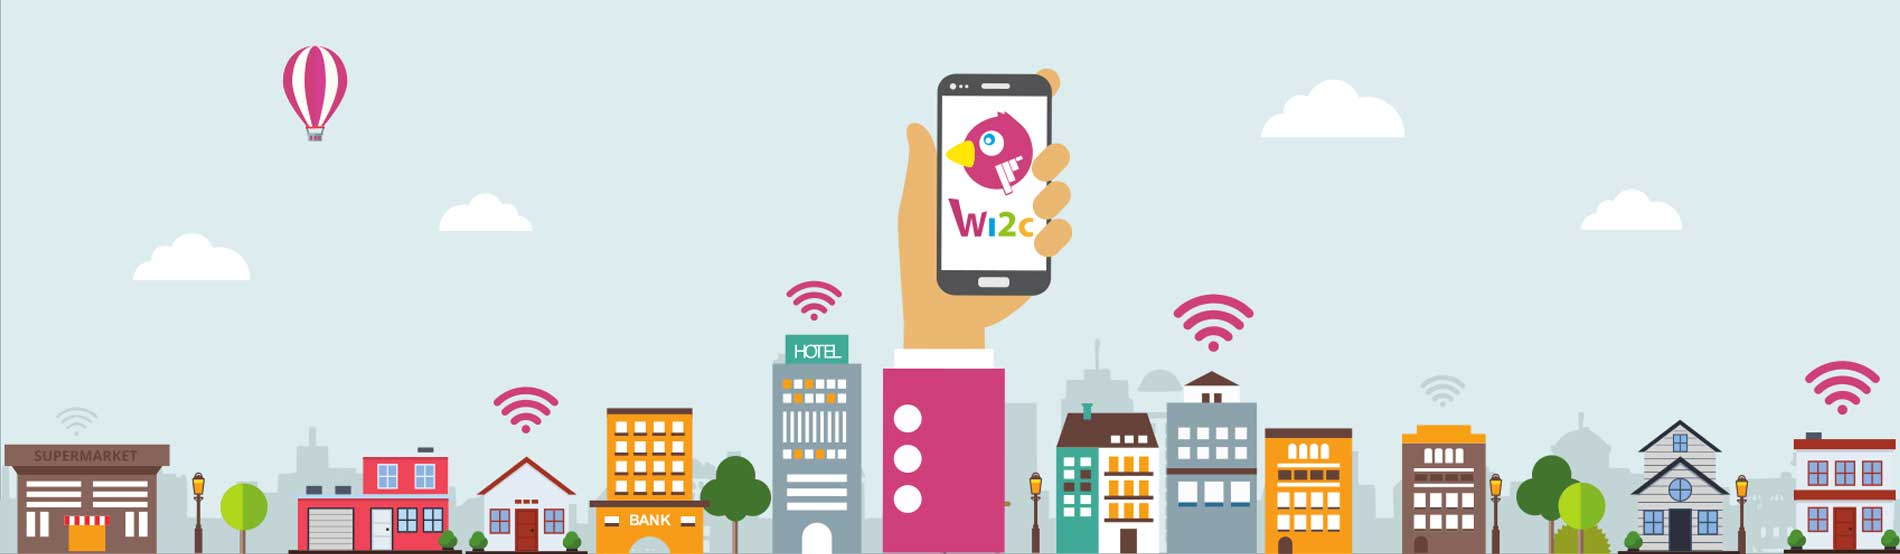 Wi2C - Smart Wifi